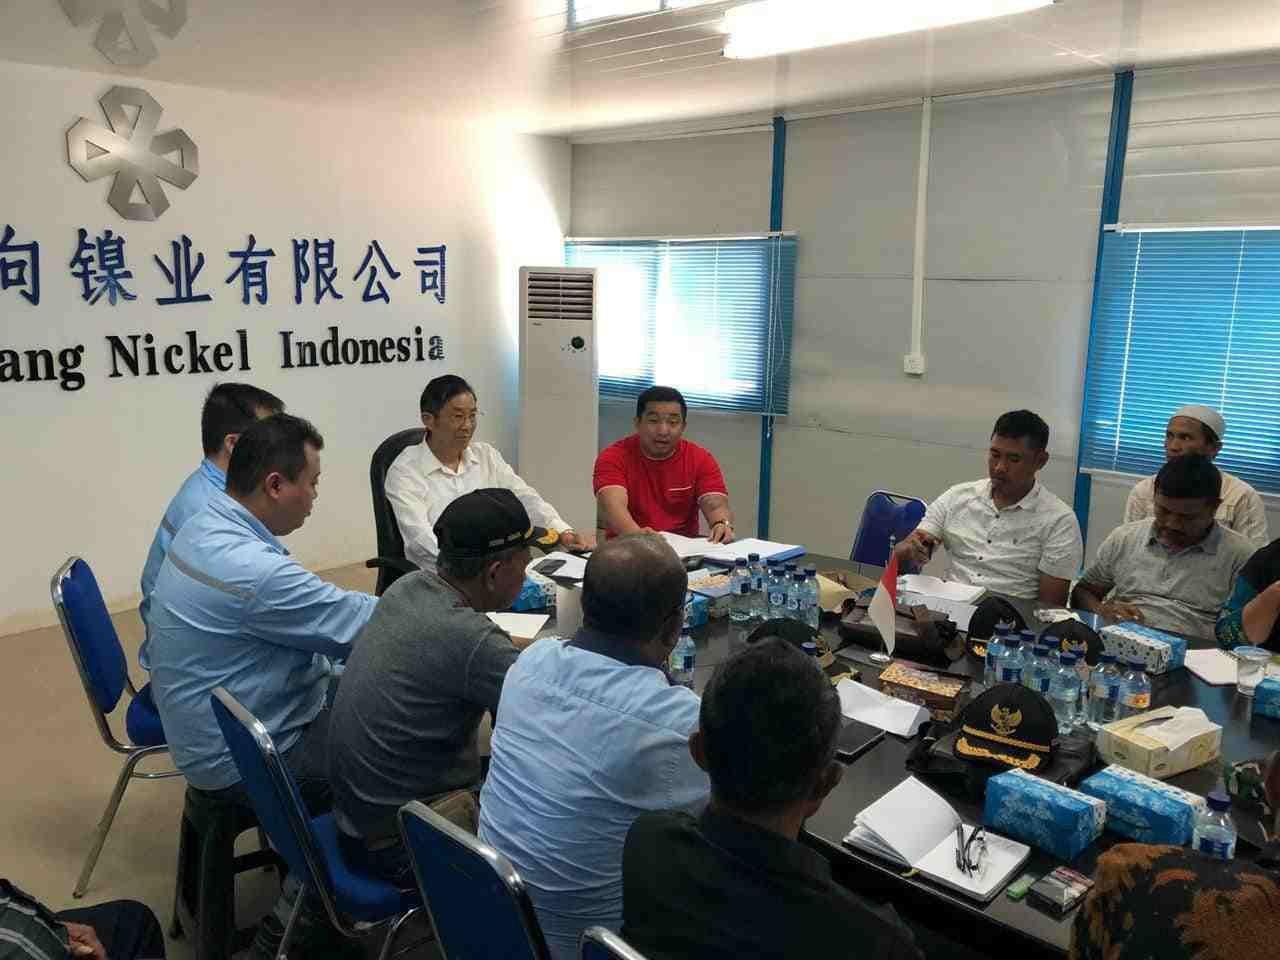 Musyawarah antara PT Wanxiang Nickel Indonesia dengan perwakilan Bumdes dari enam desa binaan dalam pembentukan Badan usaha perseroan terbatas ( PT LABUA TIMUR ) di kantor PT Wanxiang Nickel Indonesia pd selasa 11/09/2019